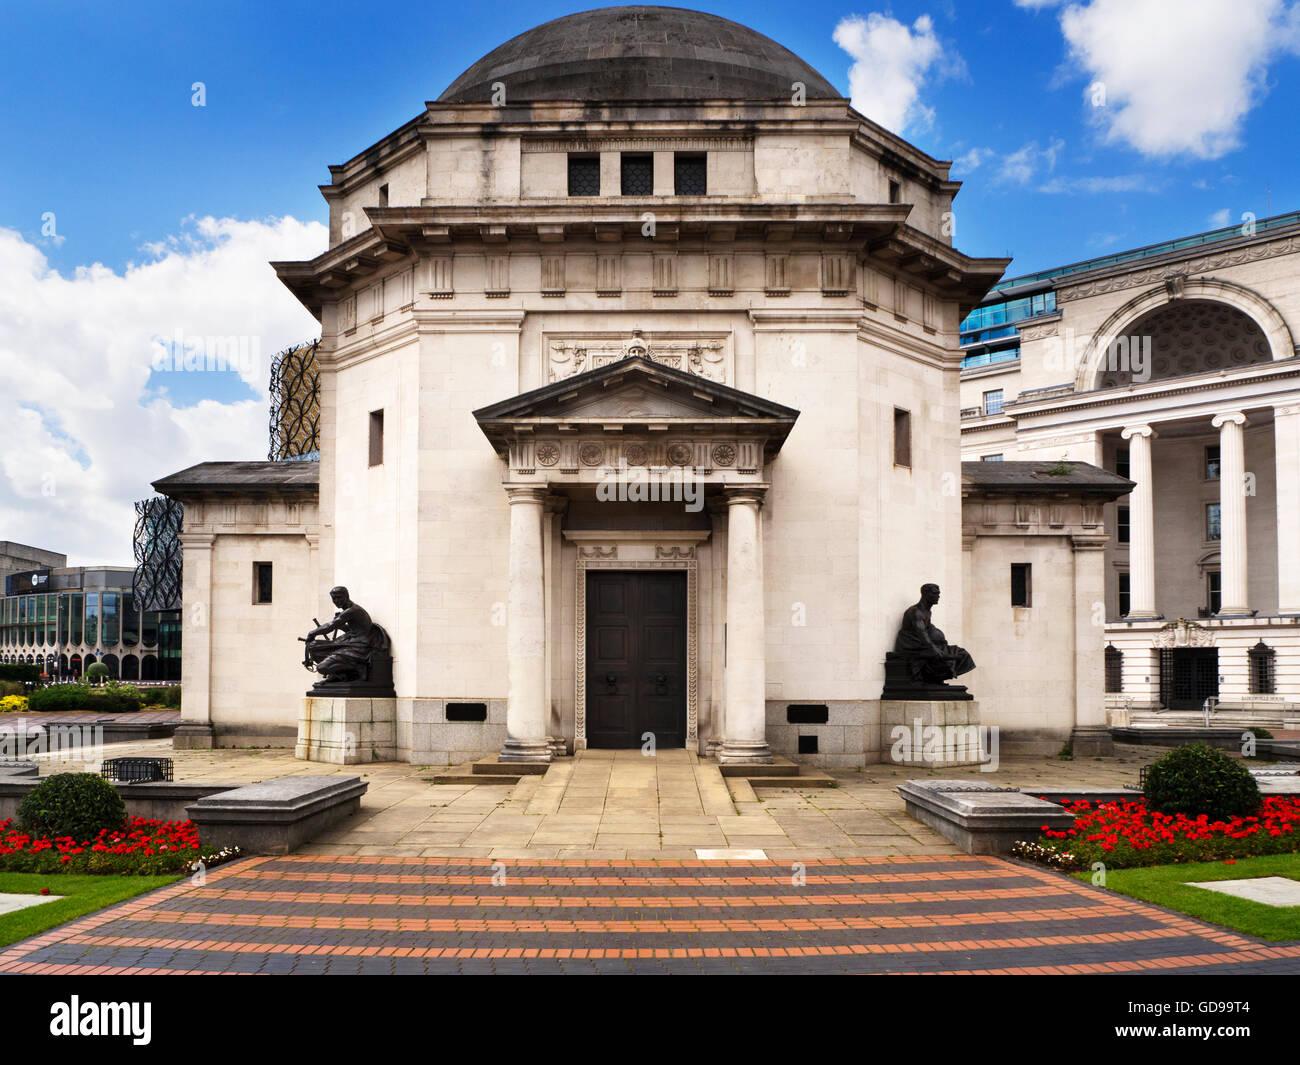 Hall of Memory War Memorial in Centenary Square Birmingham West Midlands England - Stock Image